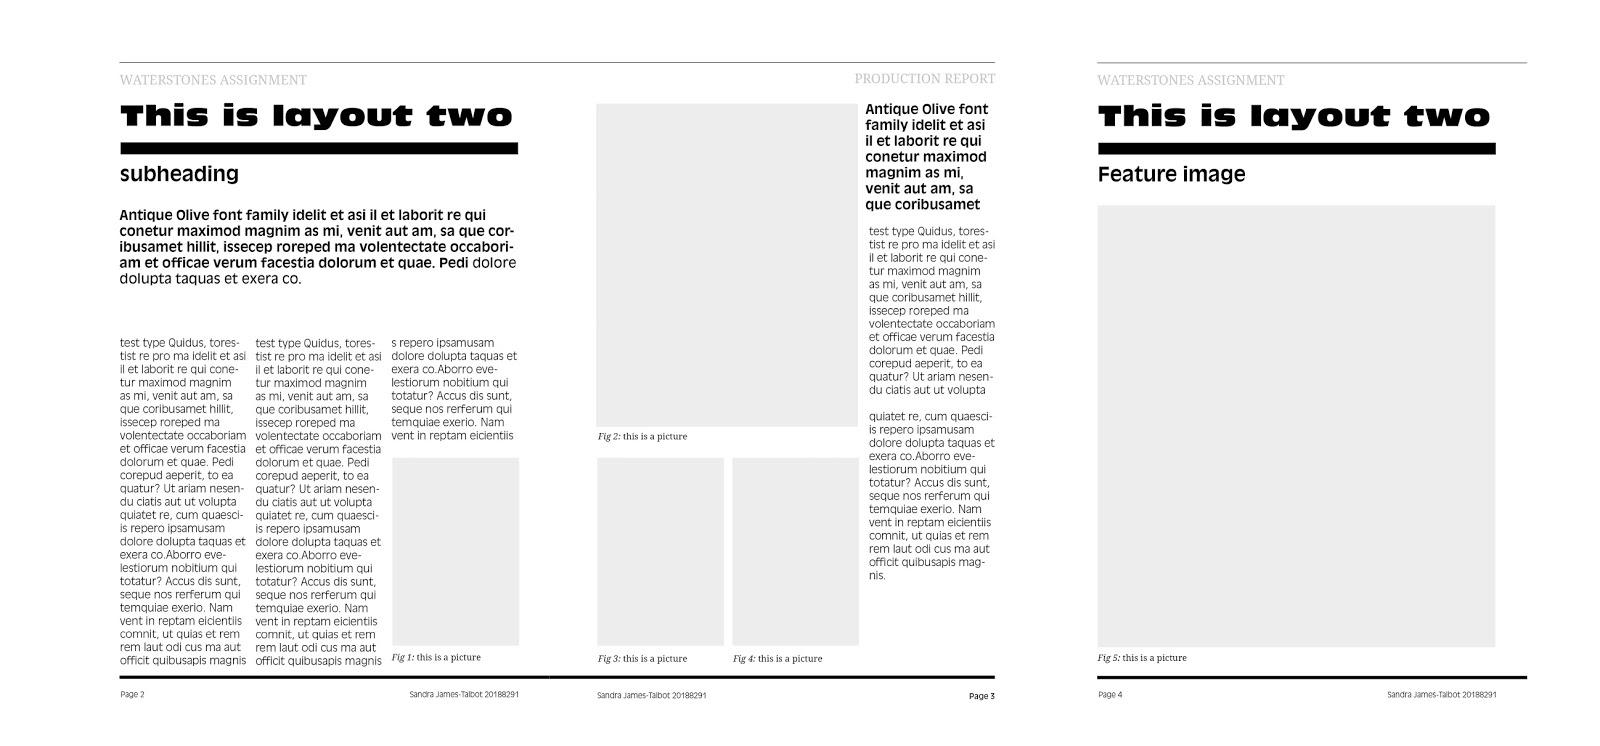 sandra james-talbot: Book layout